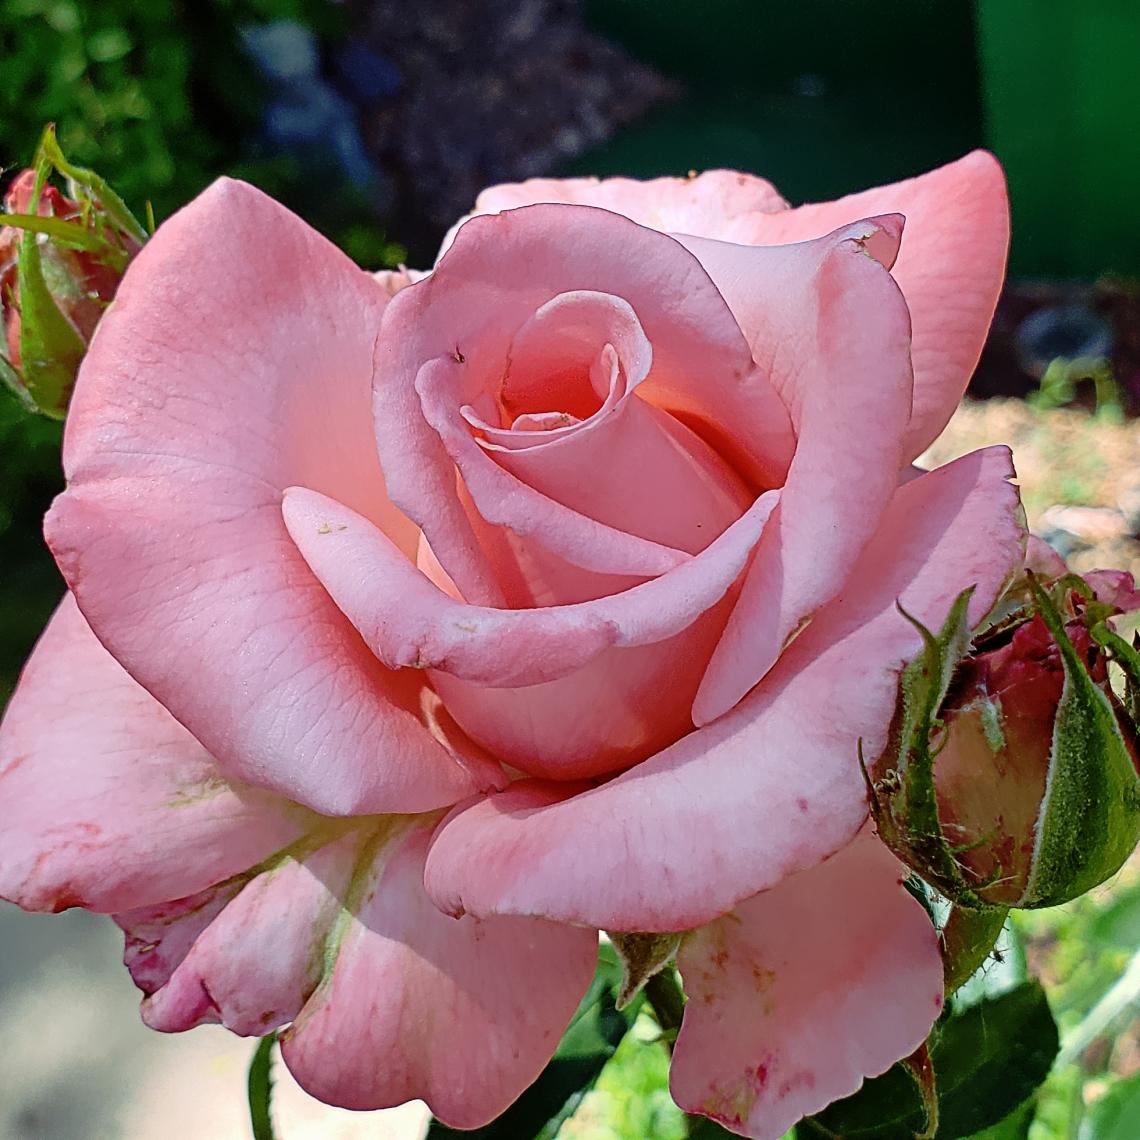 00-pinkrose-28776892458_A